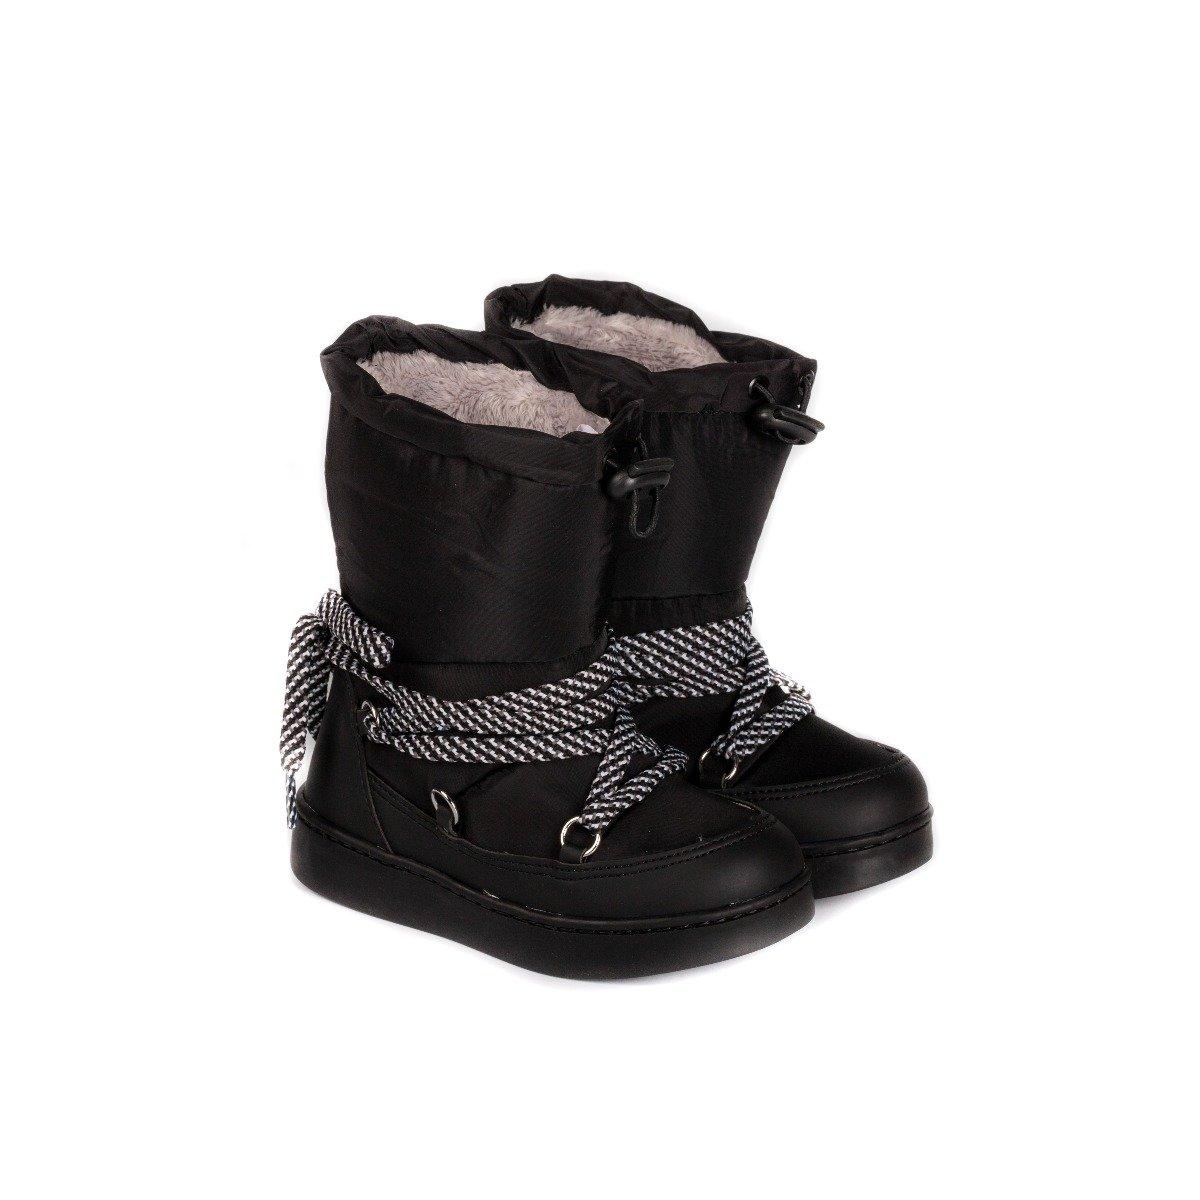 Cizme fete Bibi Urban Urban Boots Black cu blanita